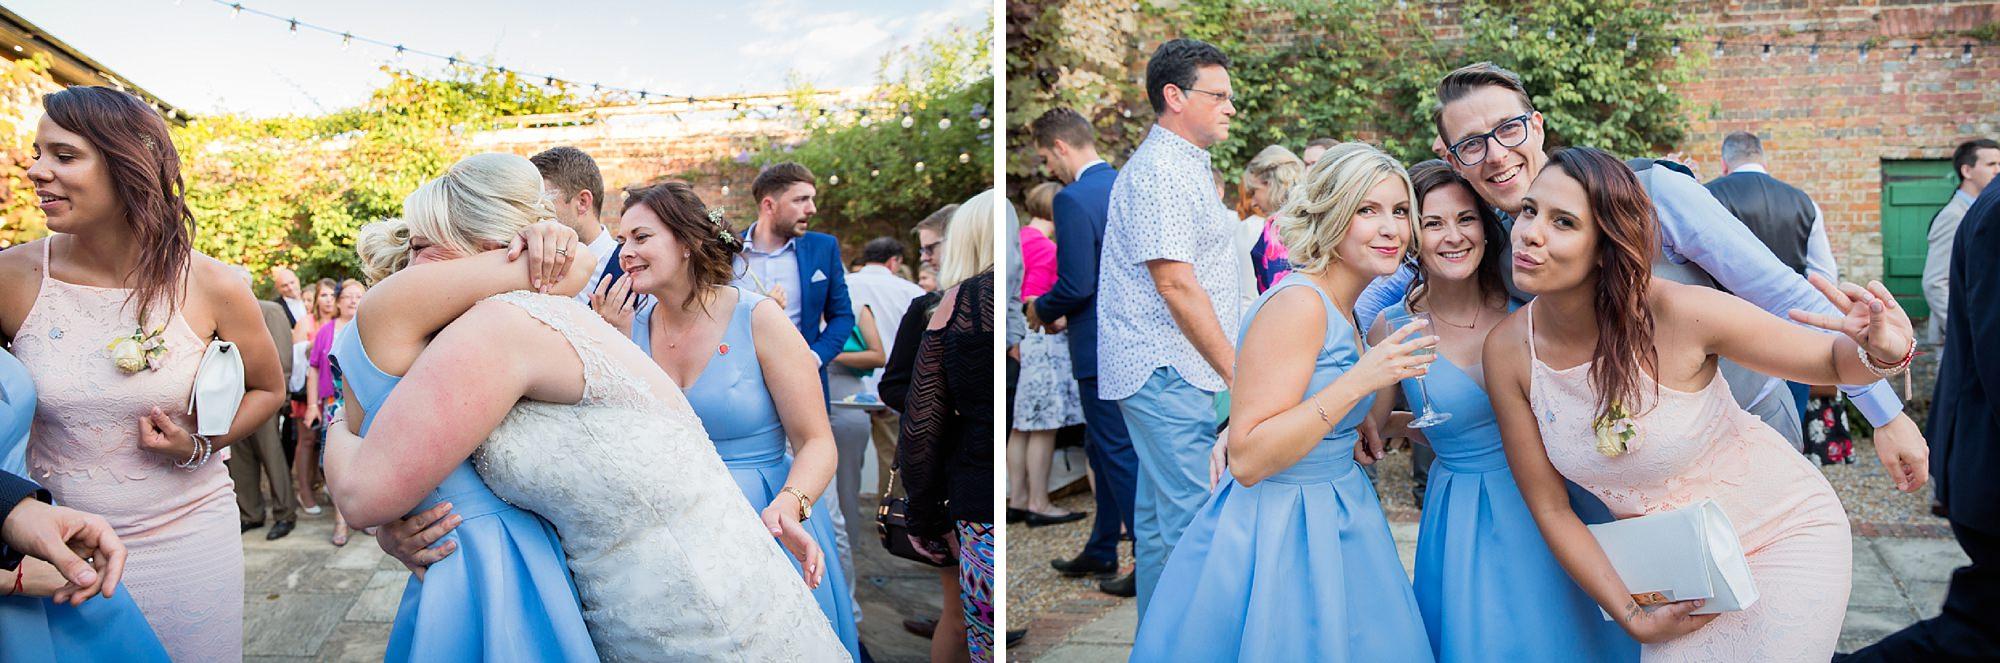 Bignor Park wedding photography fun dancing